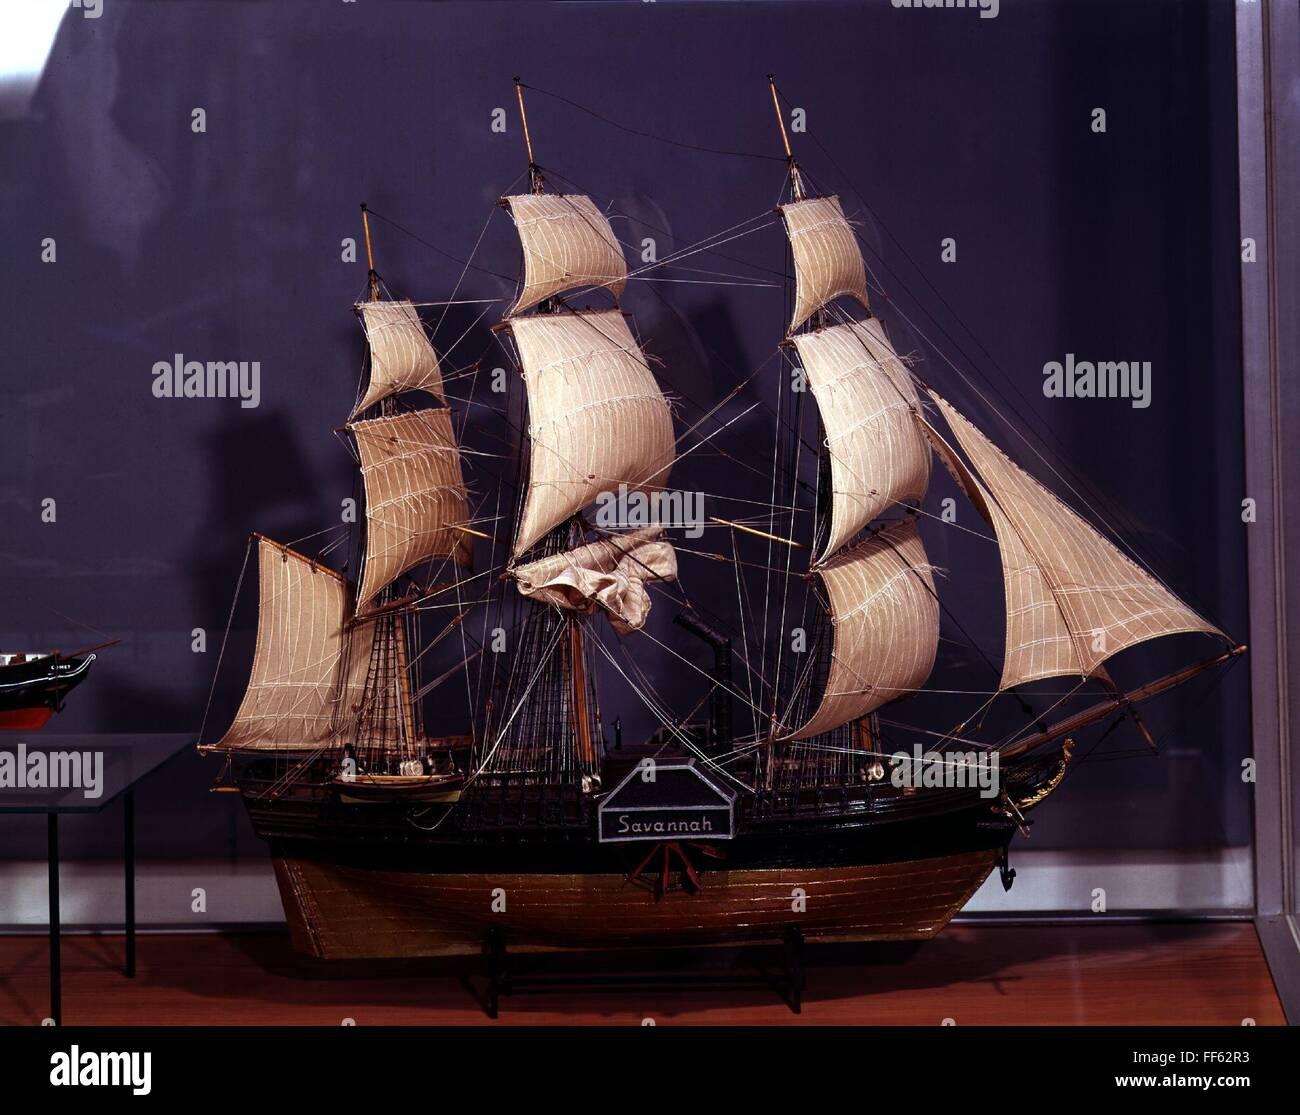 transport / transportation, navigation, paddle steamer 'Savannah', first steamship, that crossed an ocean, - Stock Image